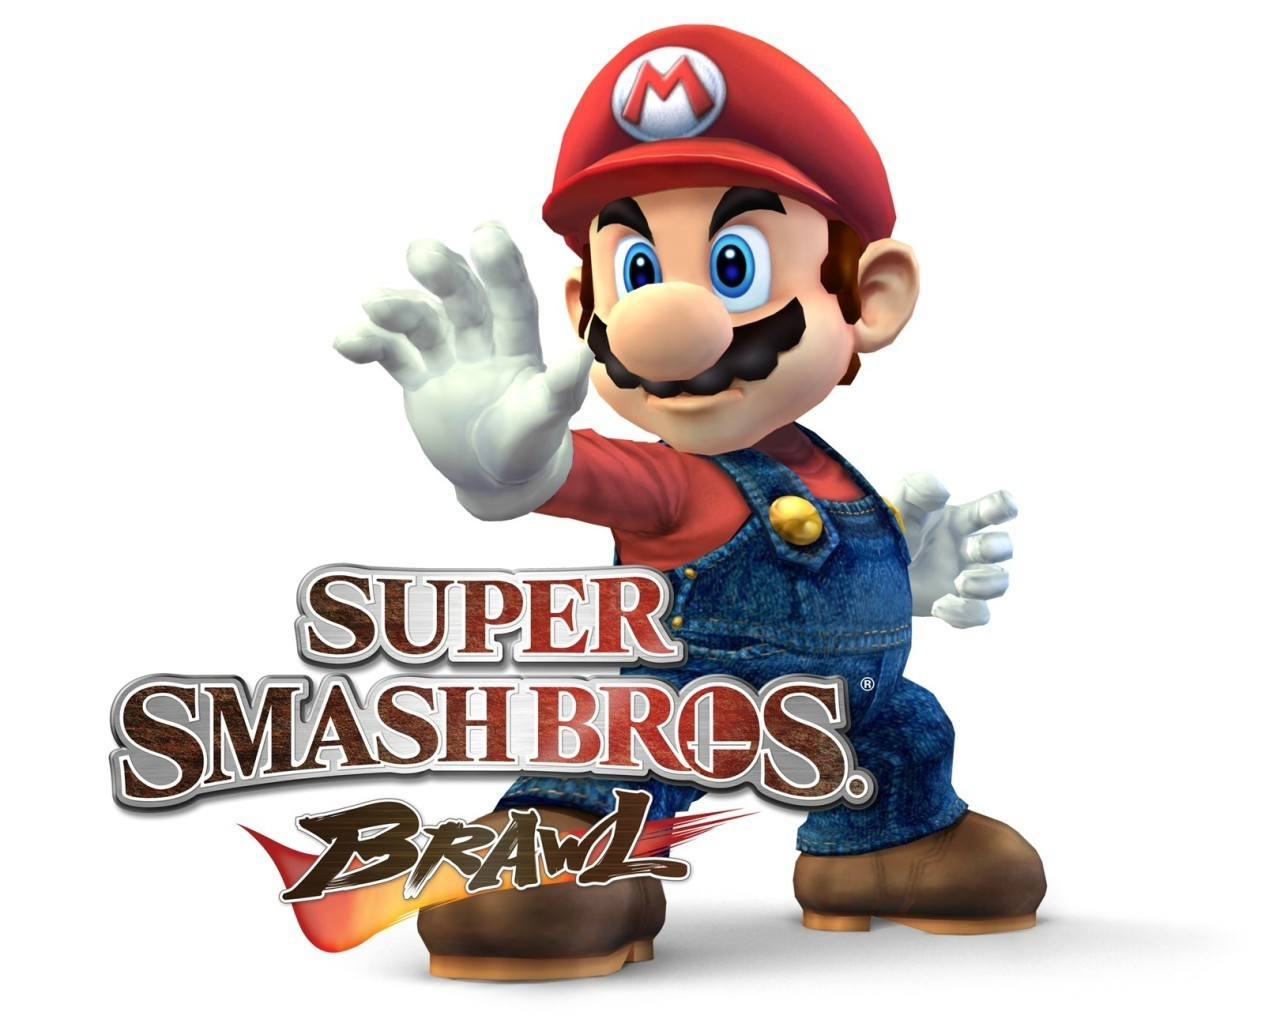 Super Smash Bros Brawl Mario Wallpaper 5614786 Fanpop